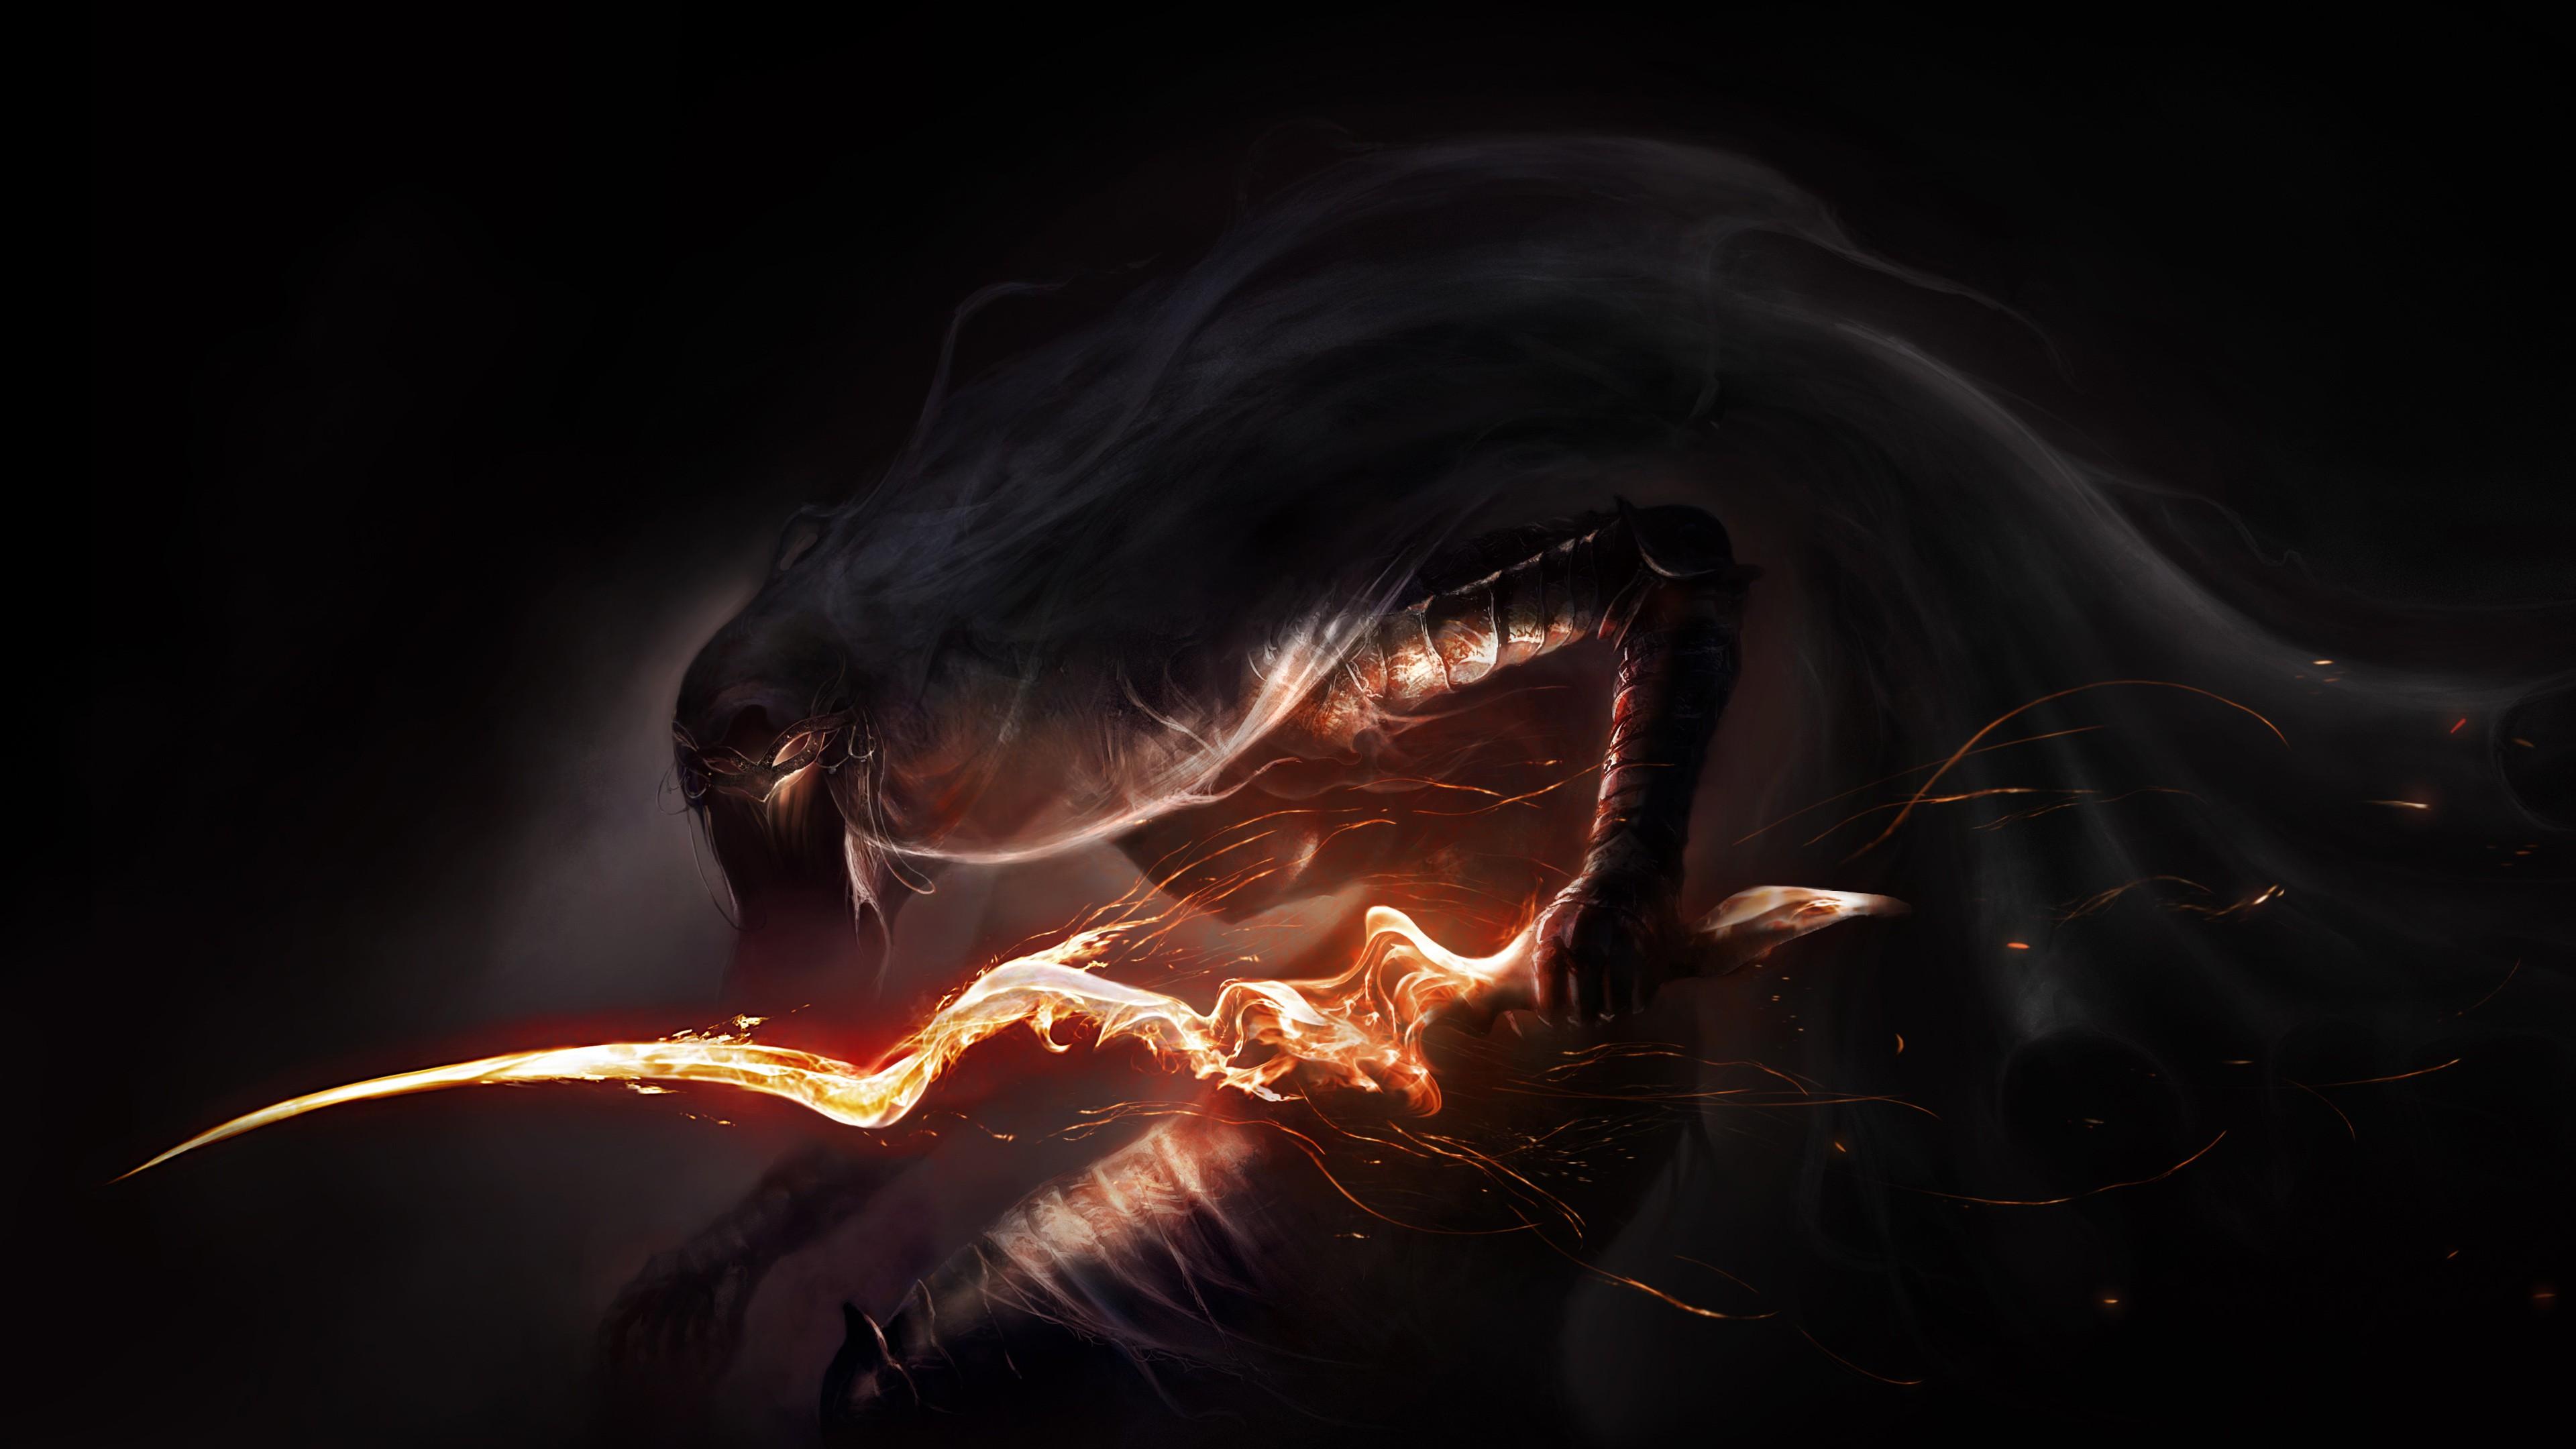 Total War Warhammer Wallpaper Hd Dark Souls Iii Monster Concept Wallpapers Hd Wallpapers